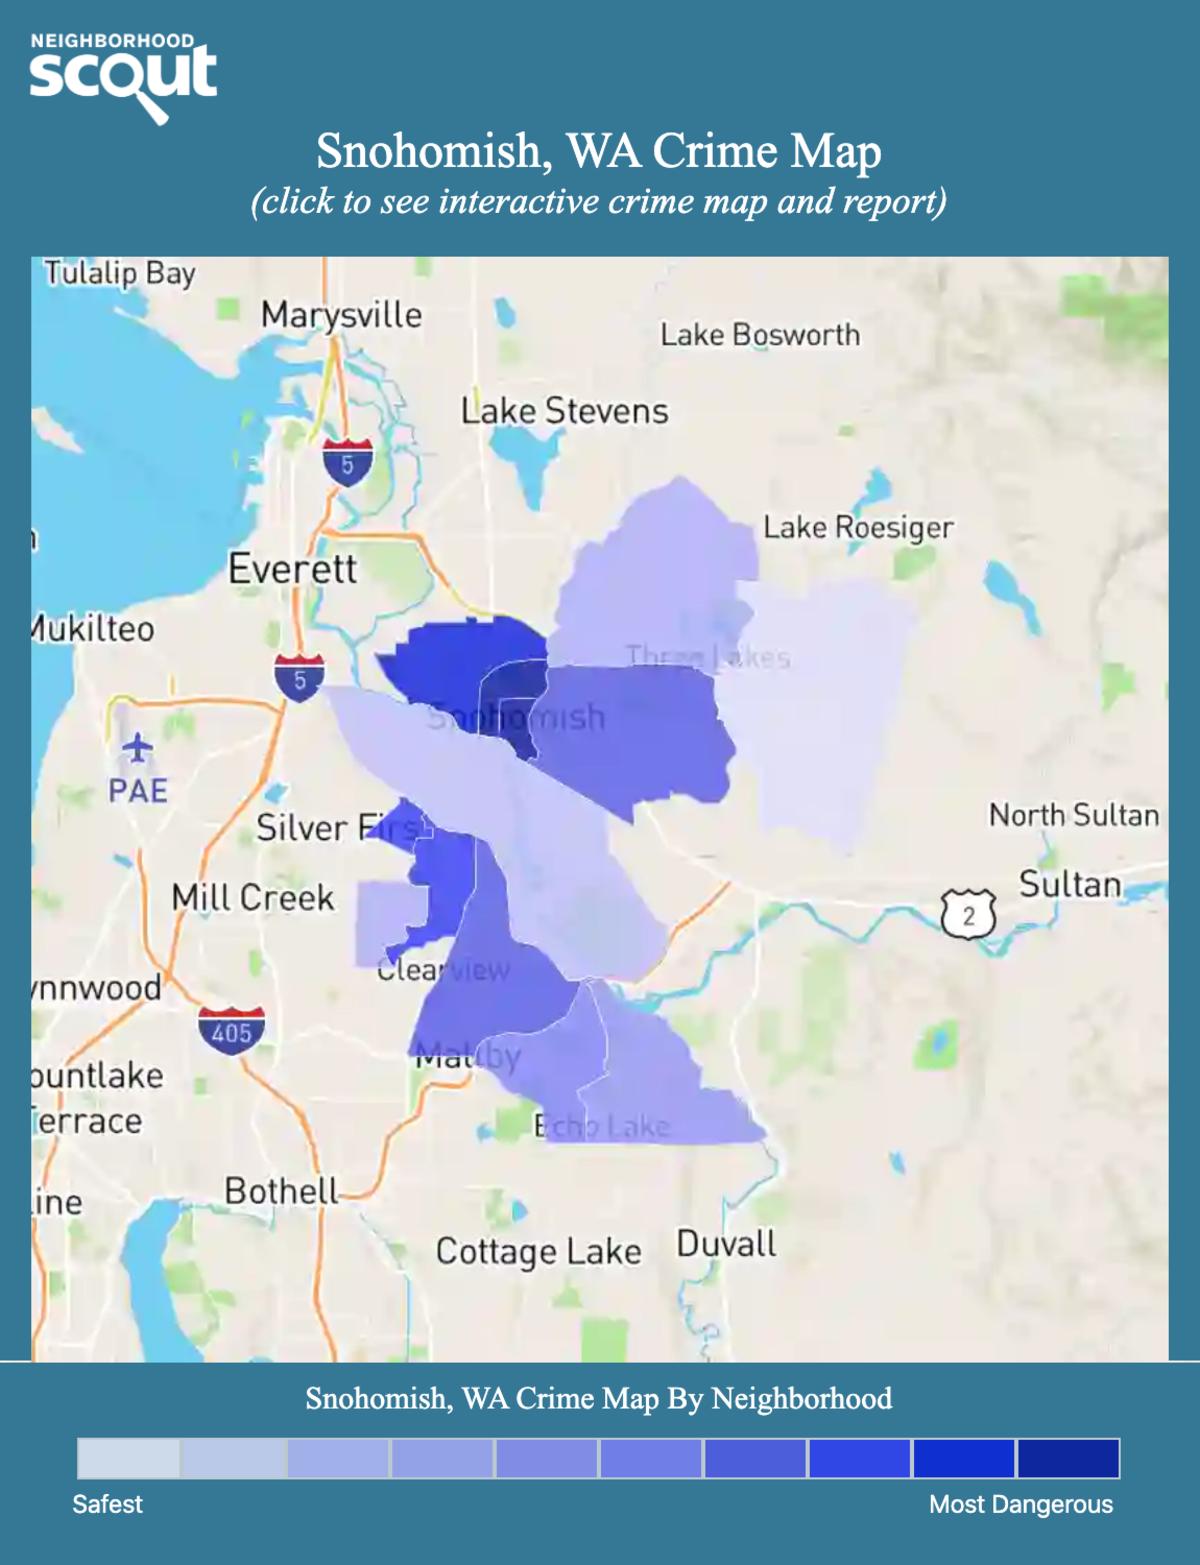 Snohomish, Washington crime map